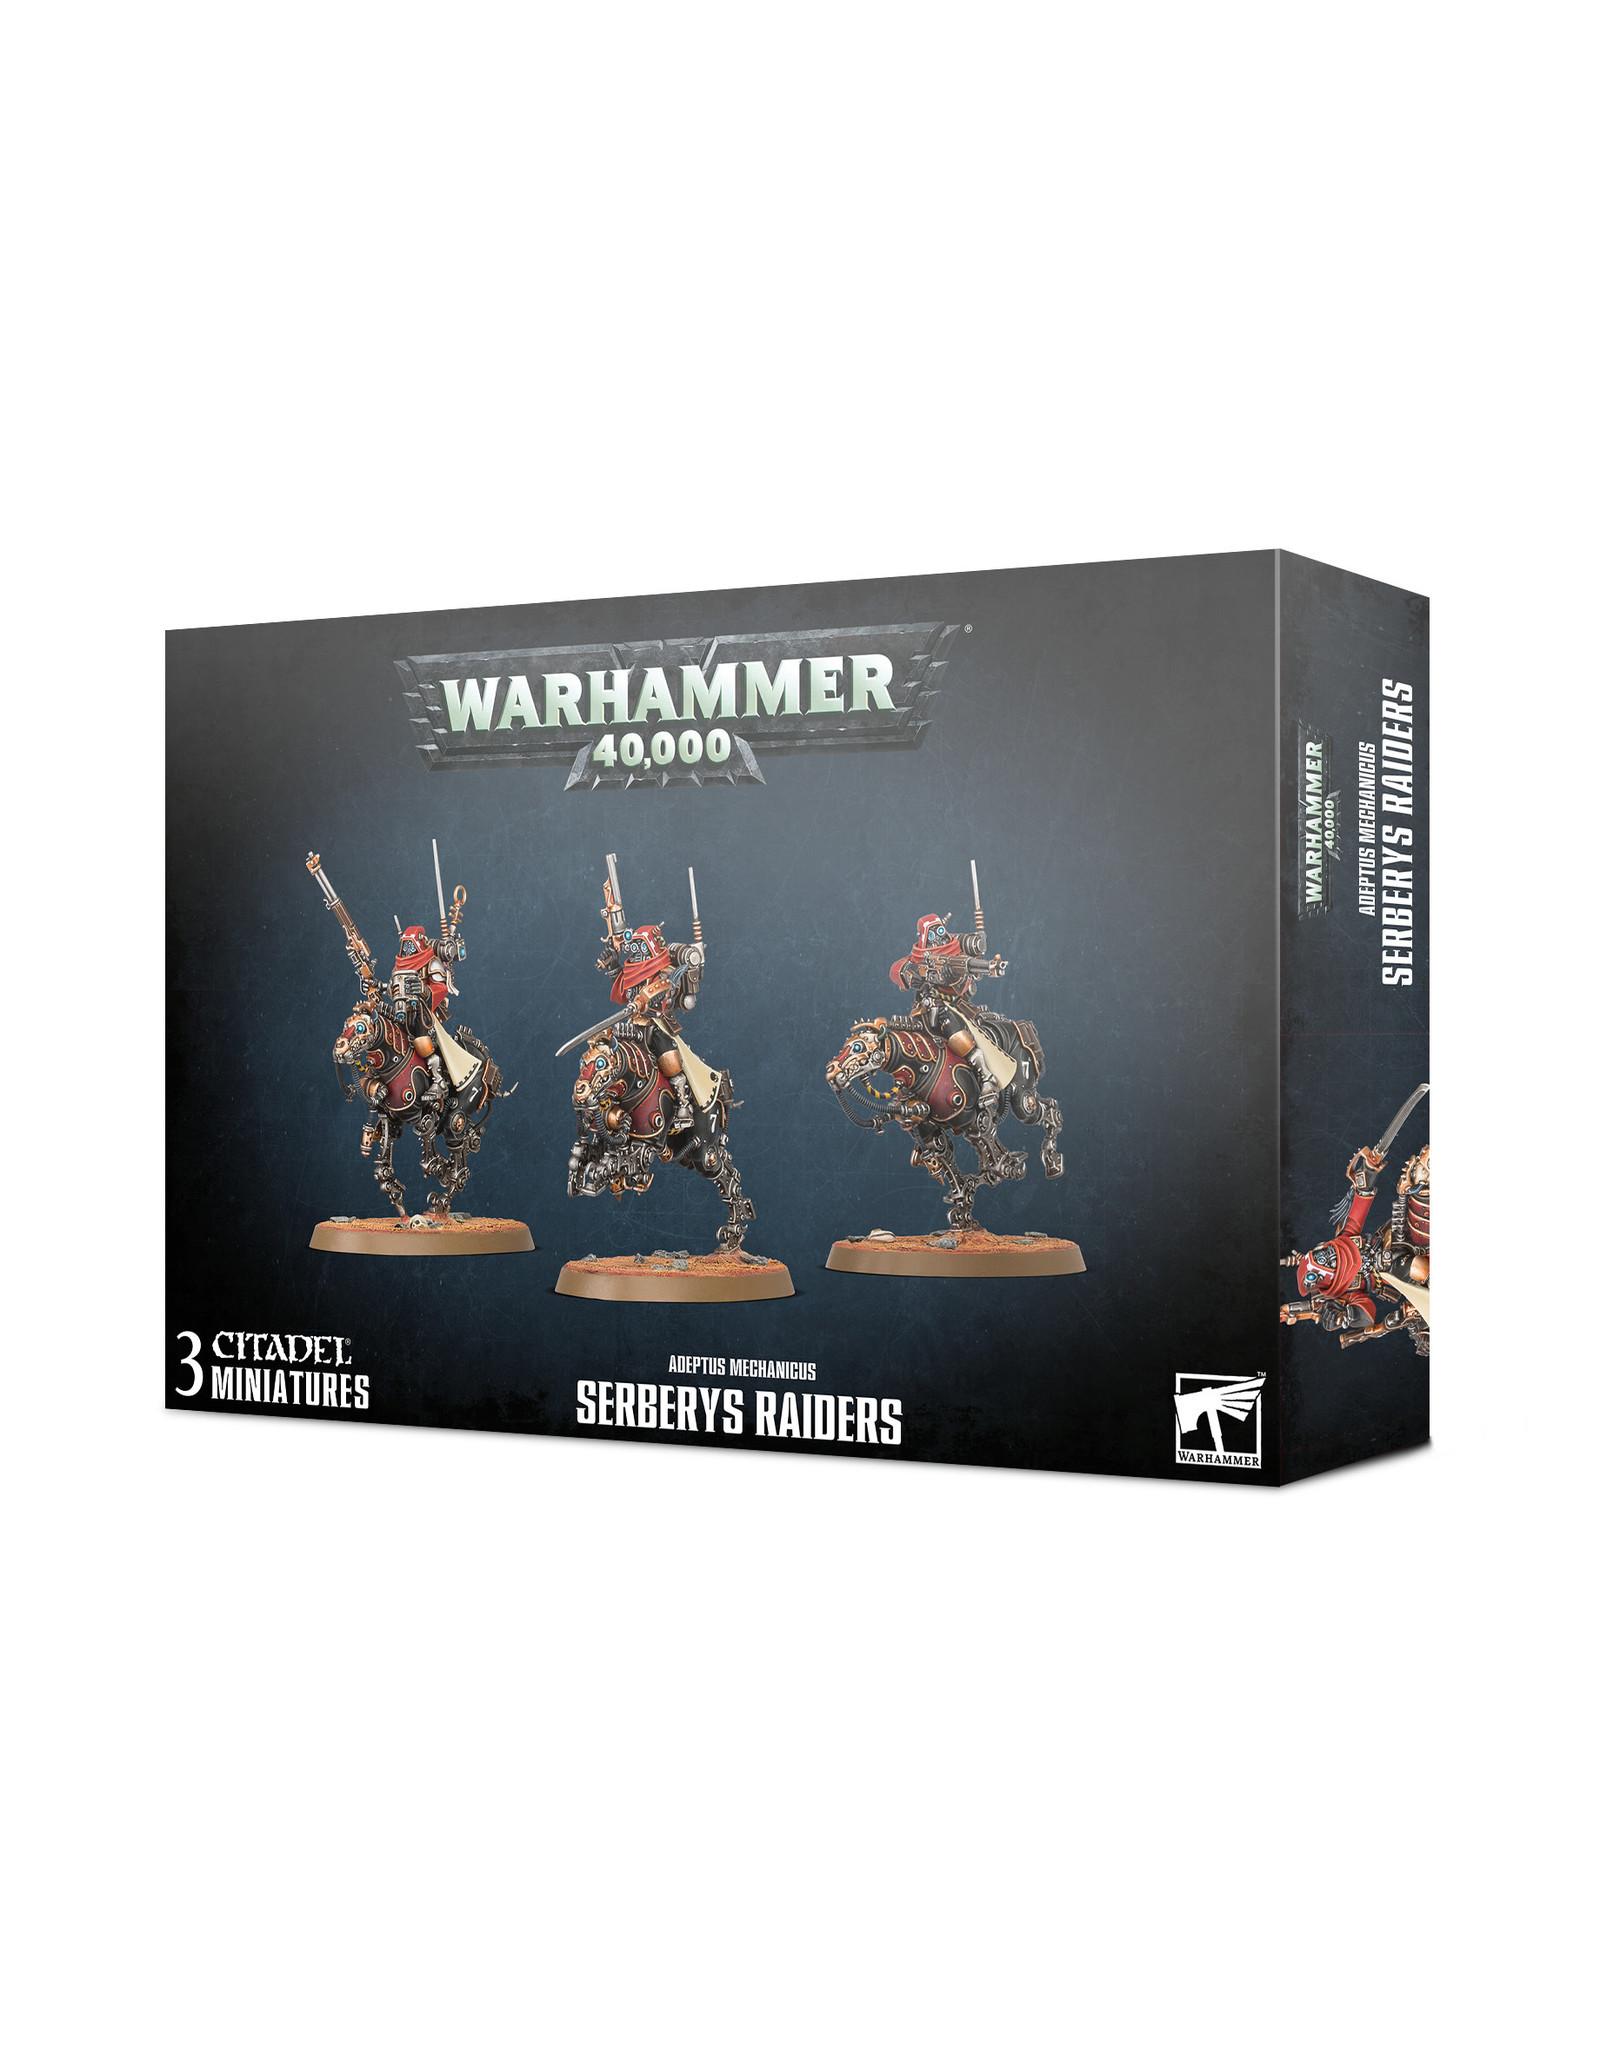 Warhammer 40,000 Adeptus Mechanicus: Serberys Raiders